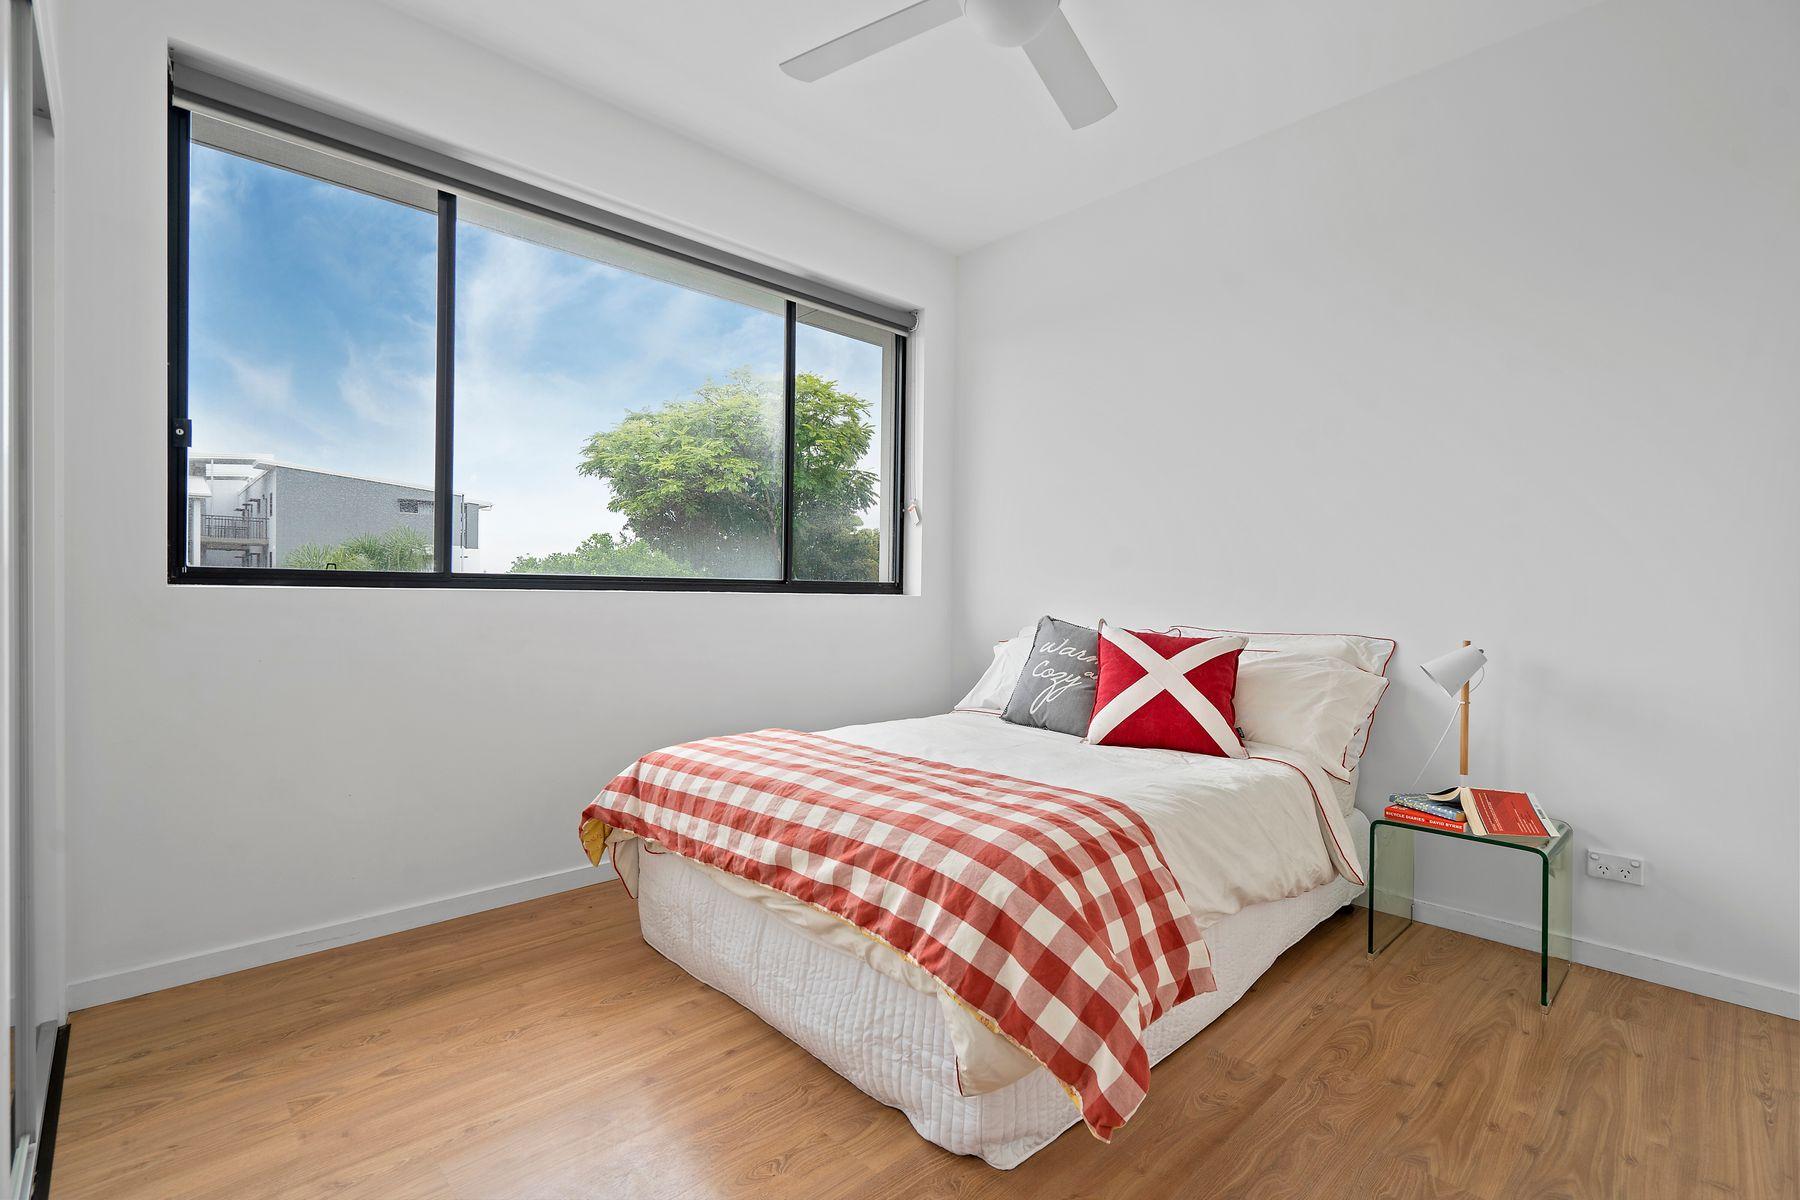 13/51-55 Lumley Street, Upper Mount Gravatt, QLD 4122